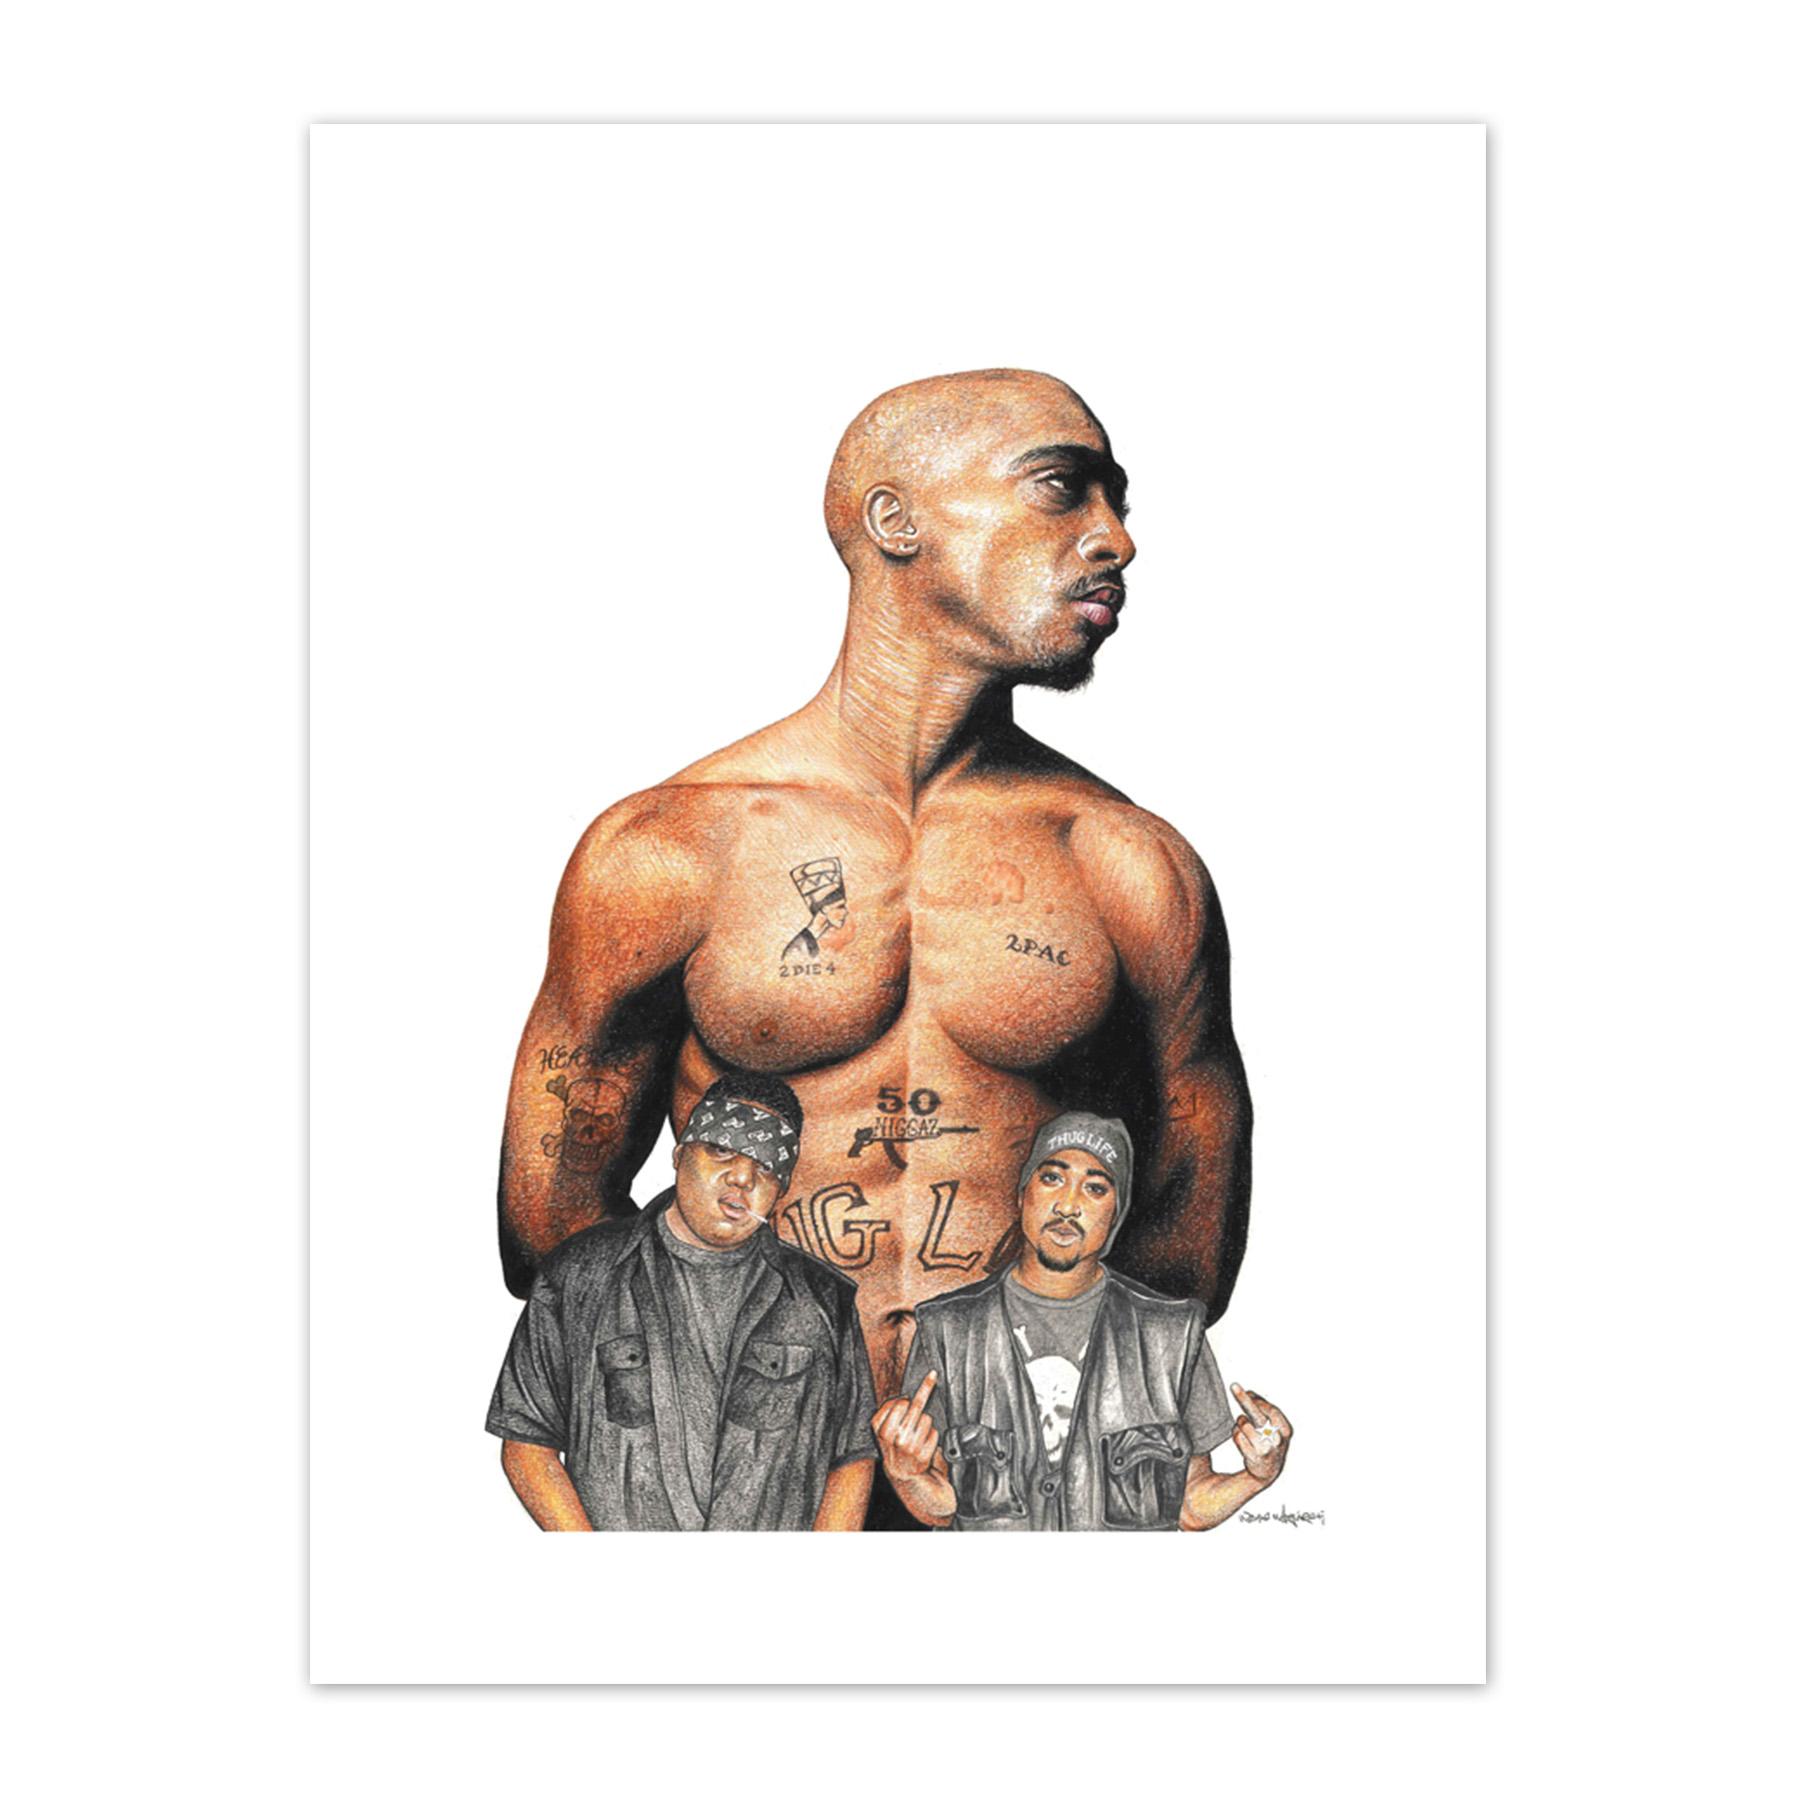 Wayne Maguire Tattooed Tupac Shakur 2Pac Biggie Inked Ikon Canvas